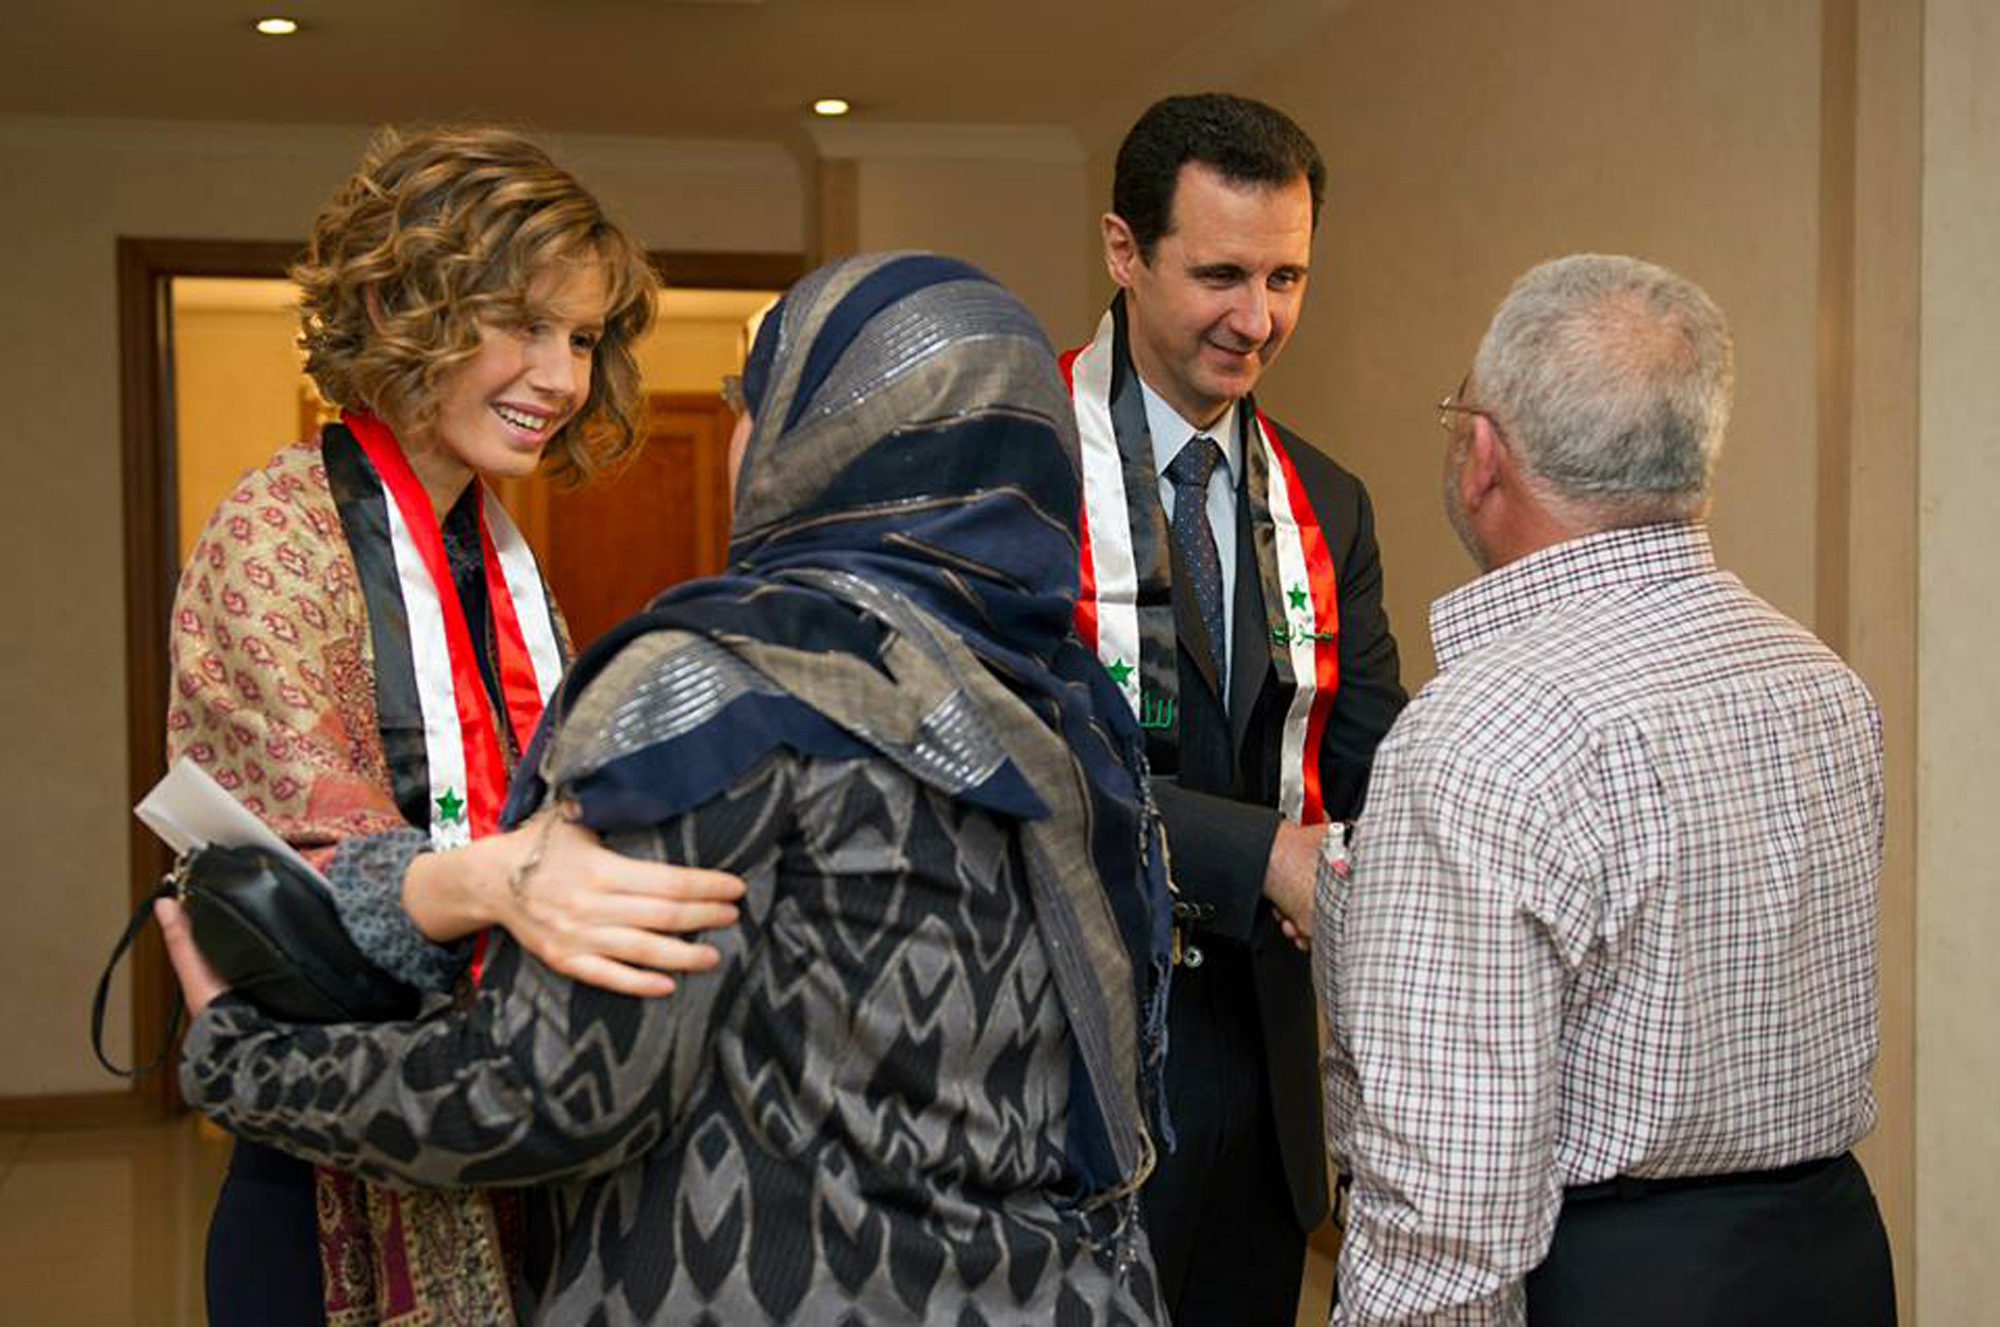 Damascus - Assad Preparing To Run For President Despite War